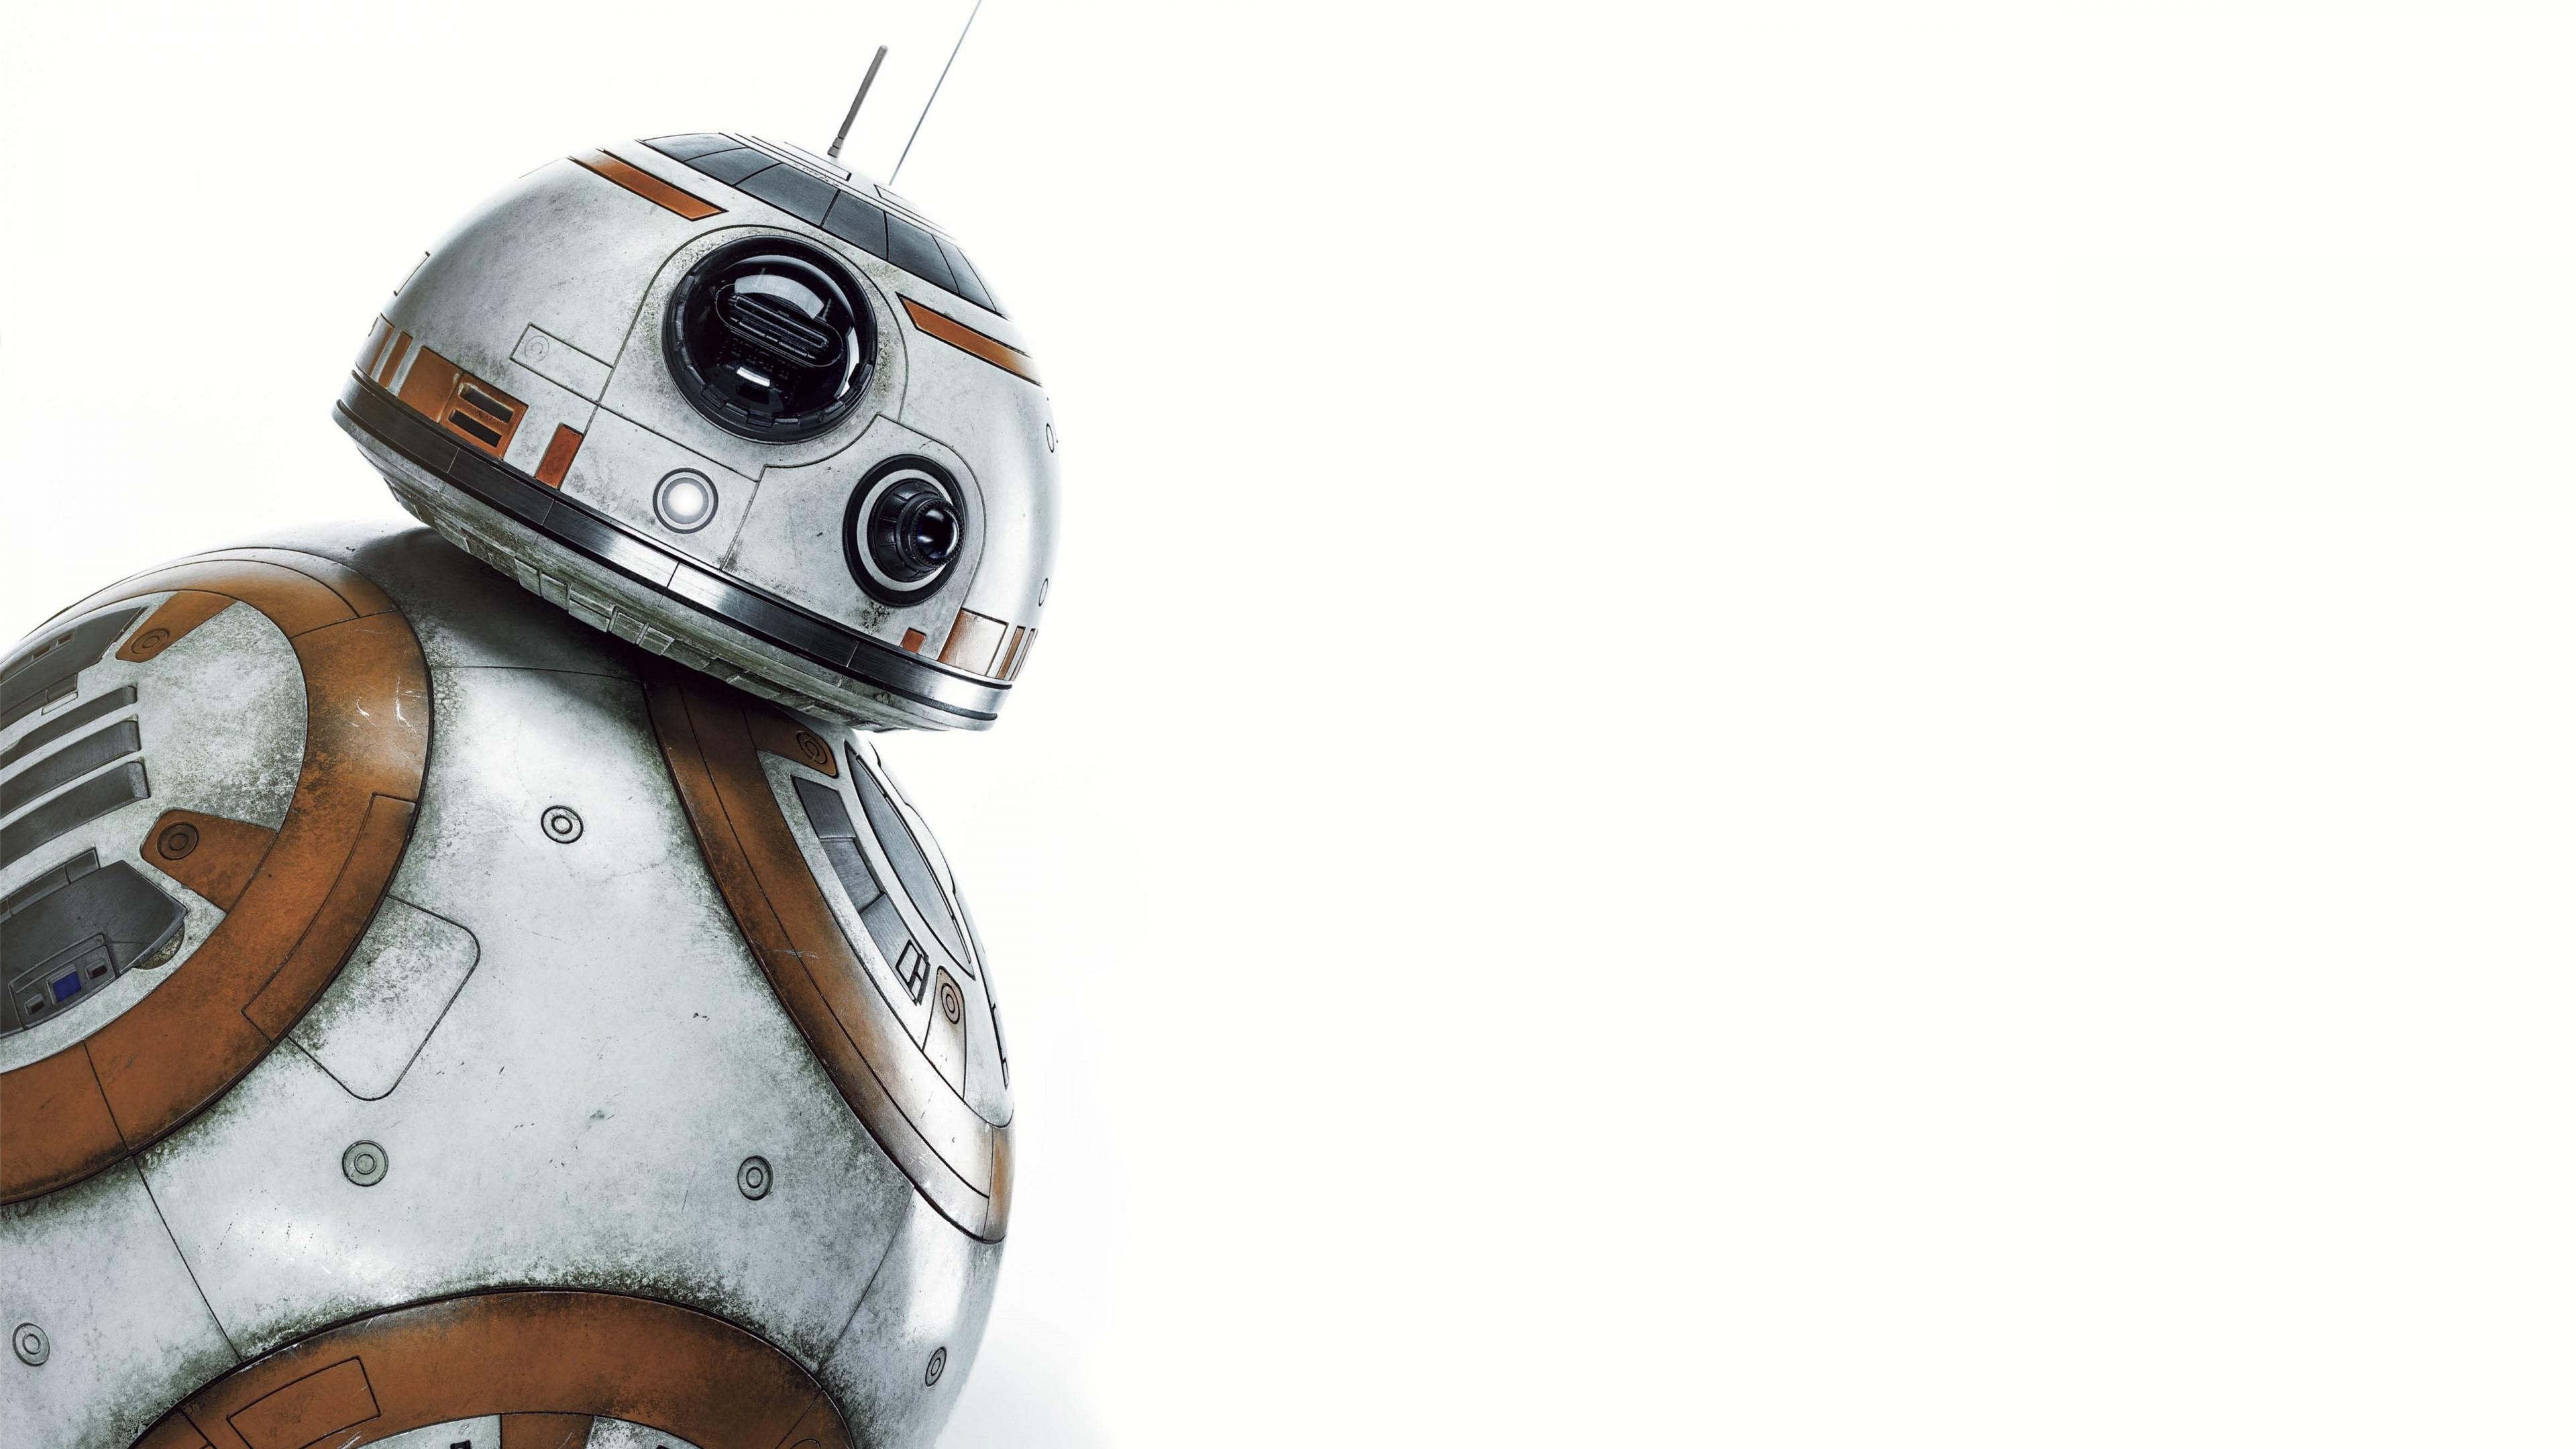 download Star Wars BB 8 Droid 4K 5K Wallpapers HD Wallpapers 3840x2160